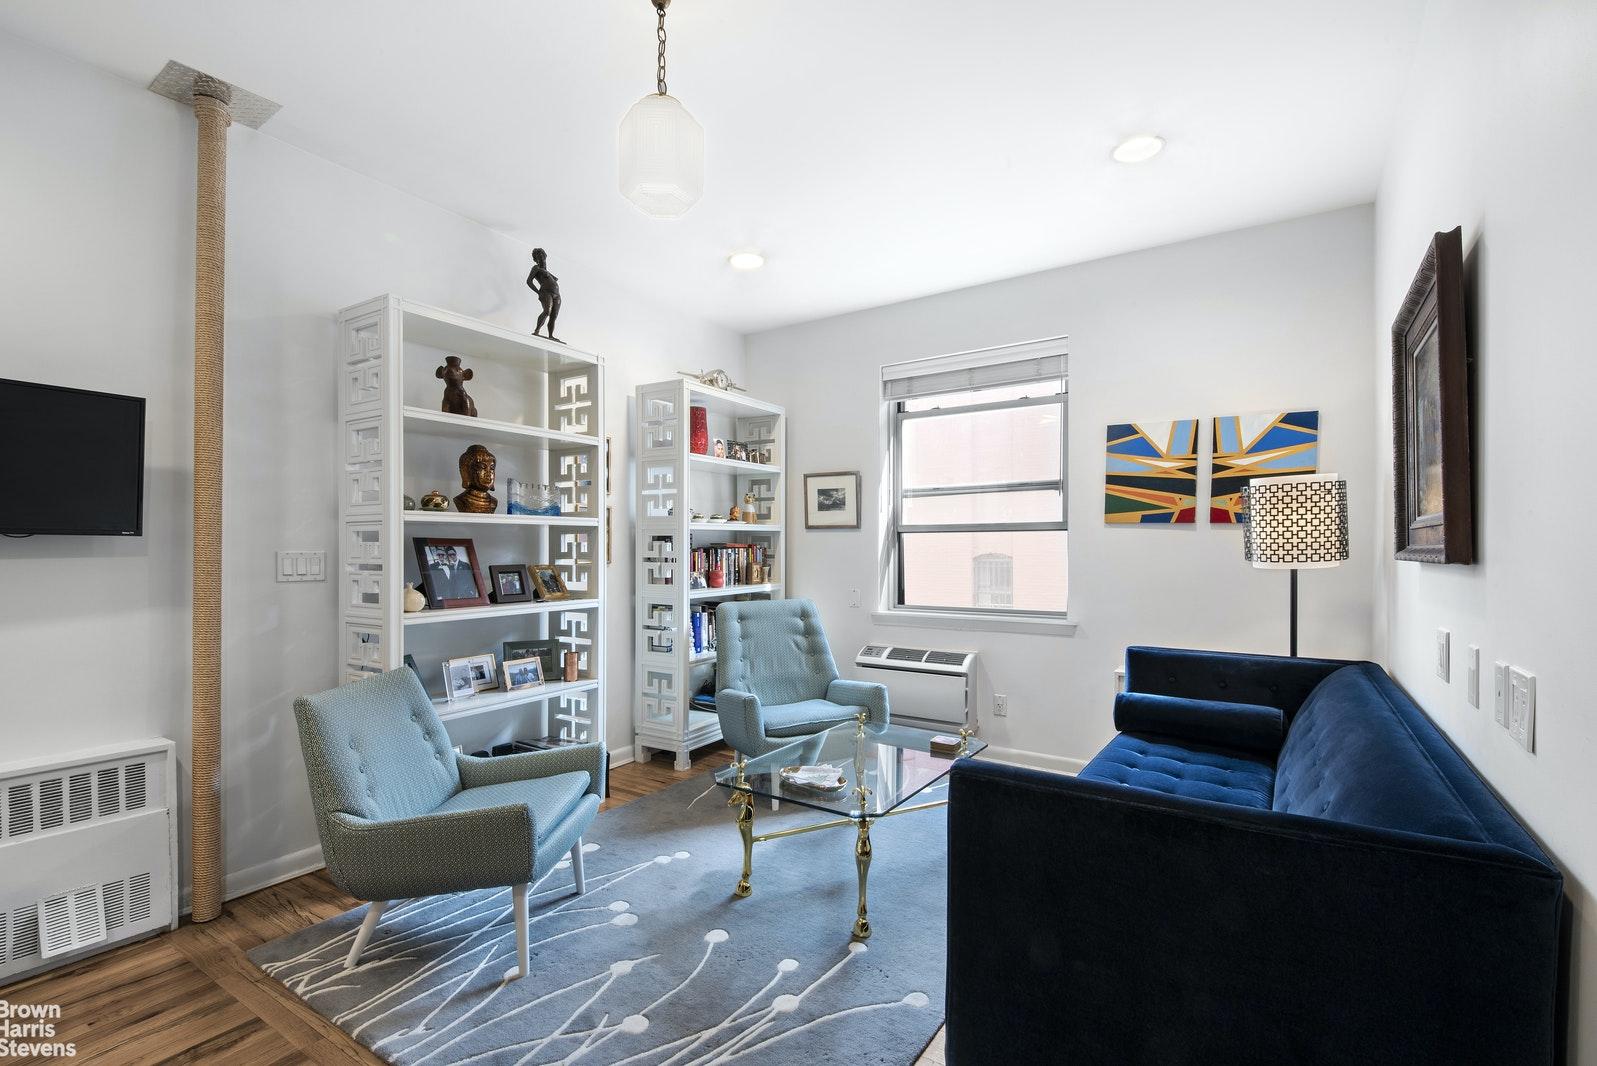 Apartment for sale at 2790 Broadway, Apt 6D/7D